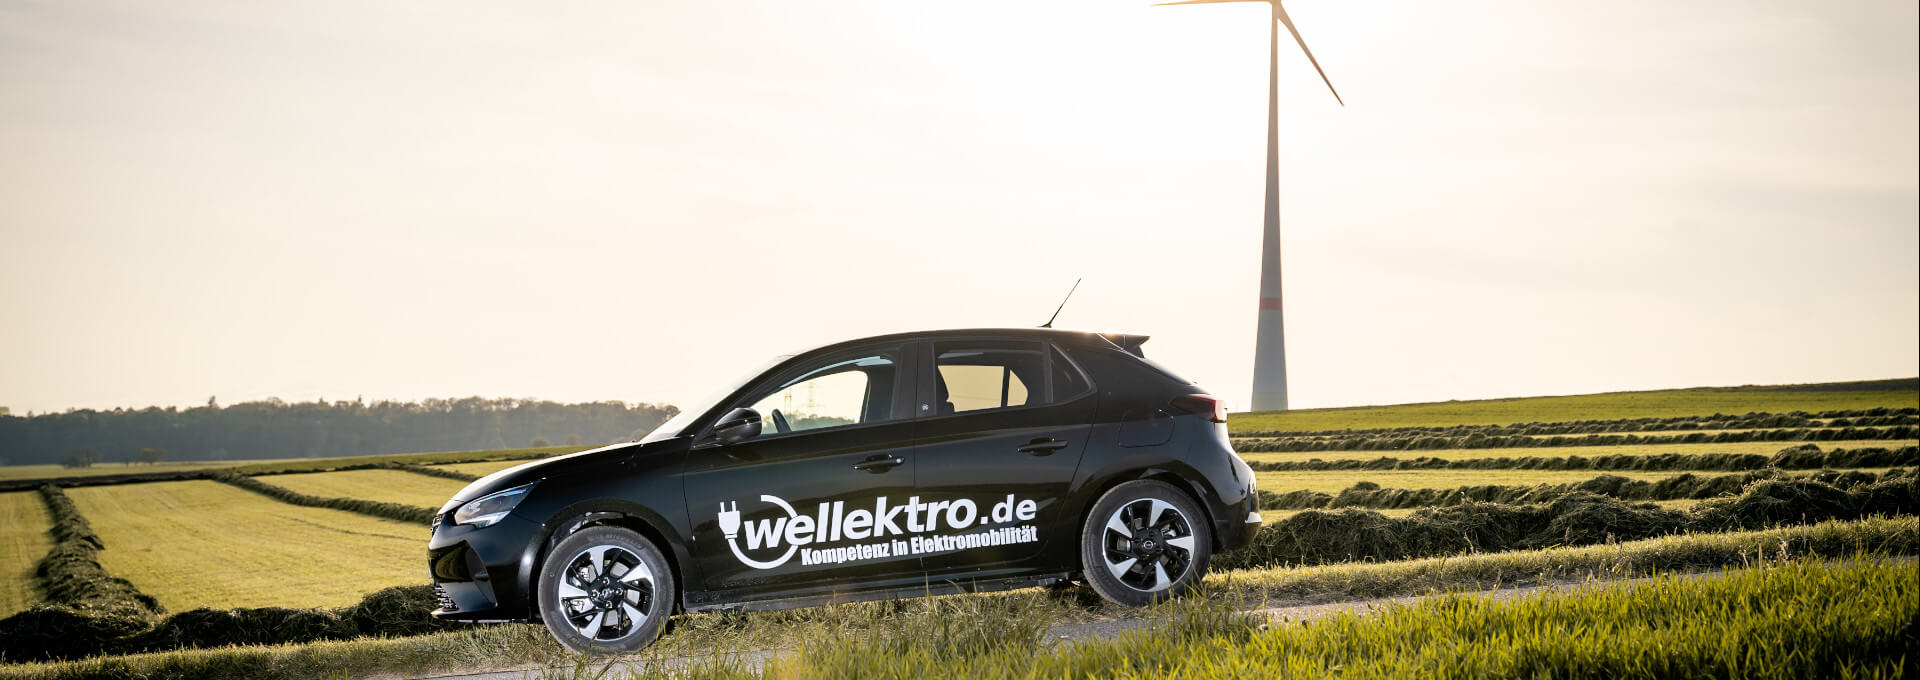 schwarzer Corsa Elektro vor Windrad